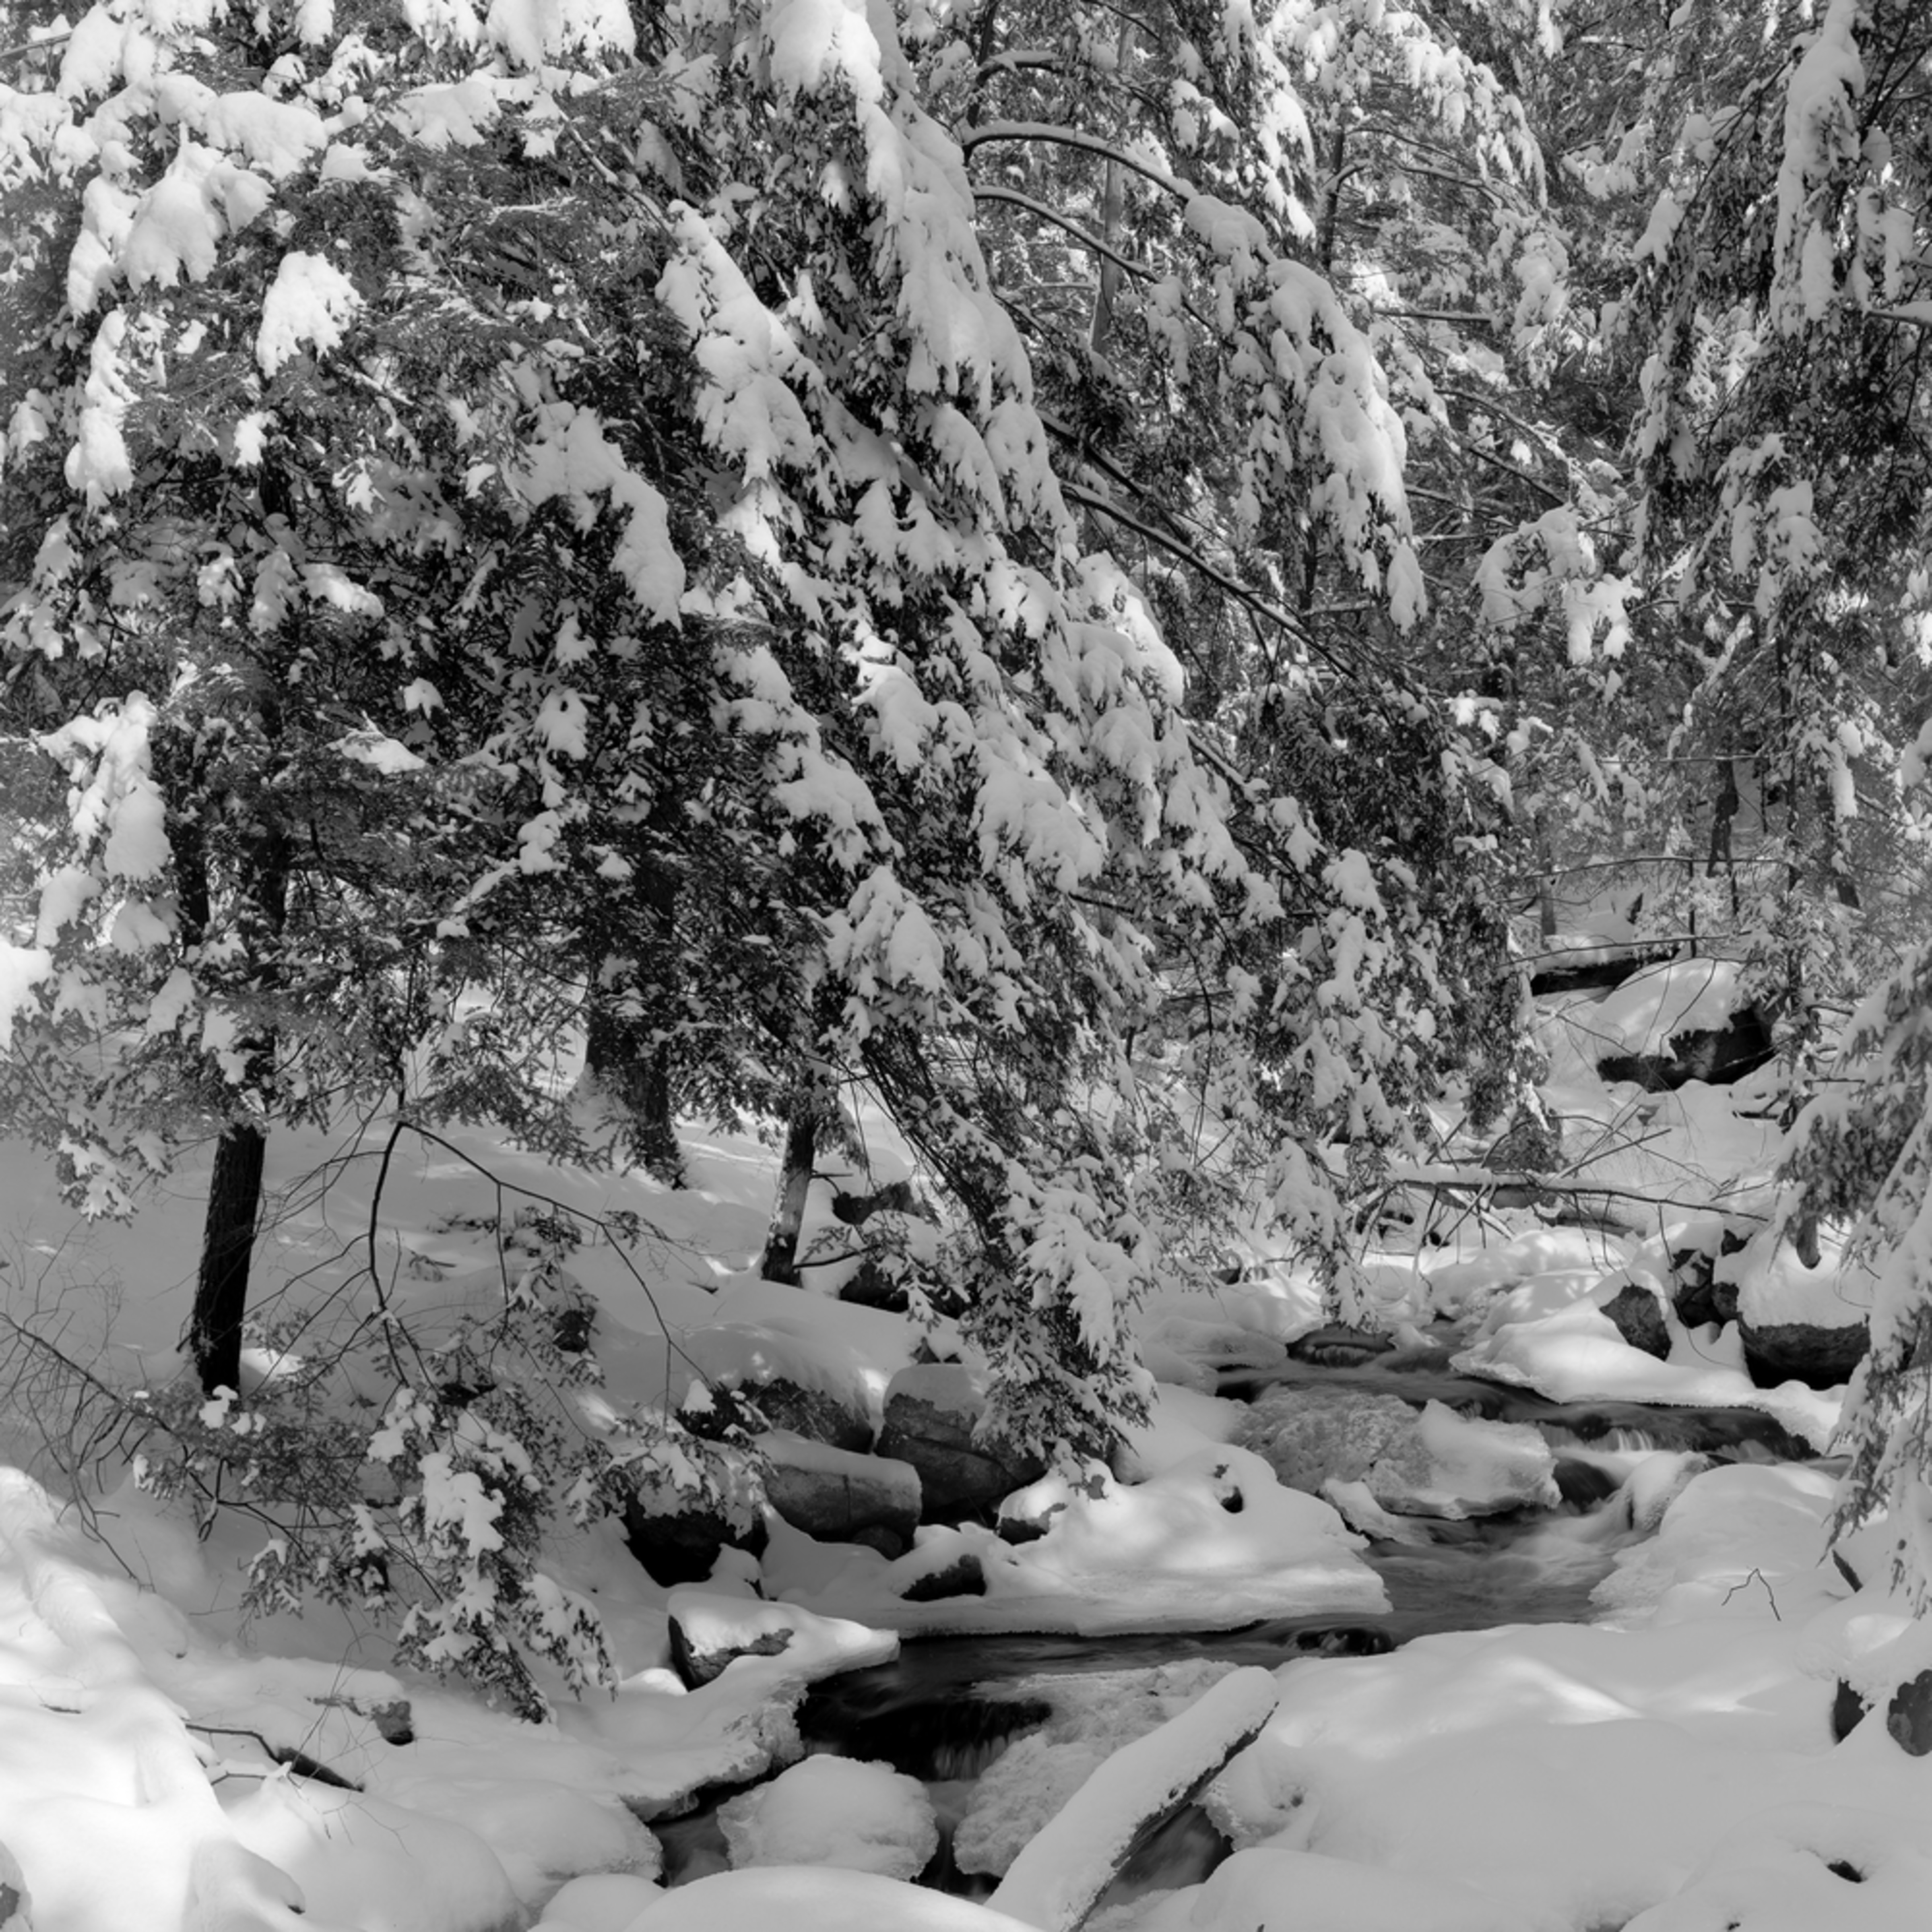 Winterwhitevalhala creek f59mme